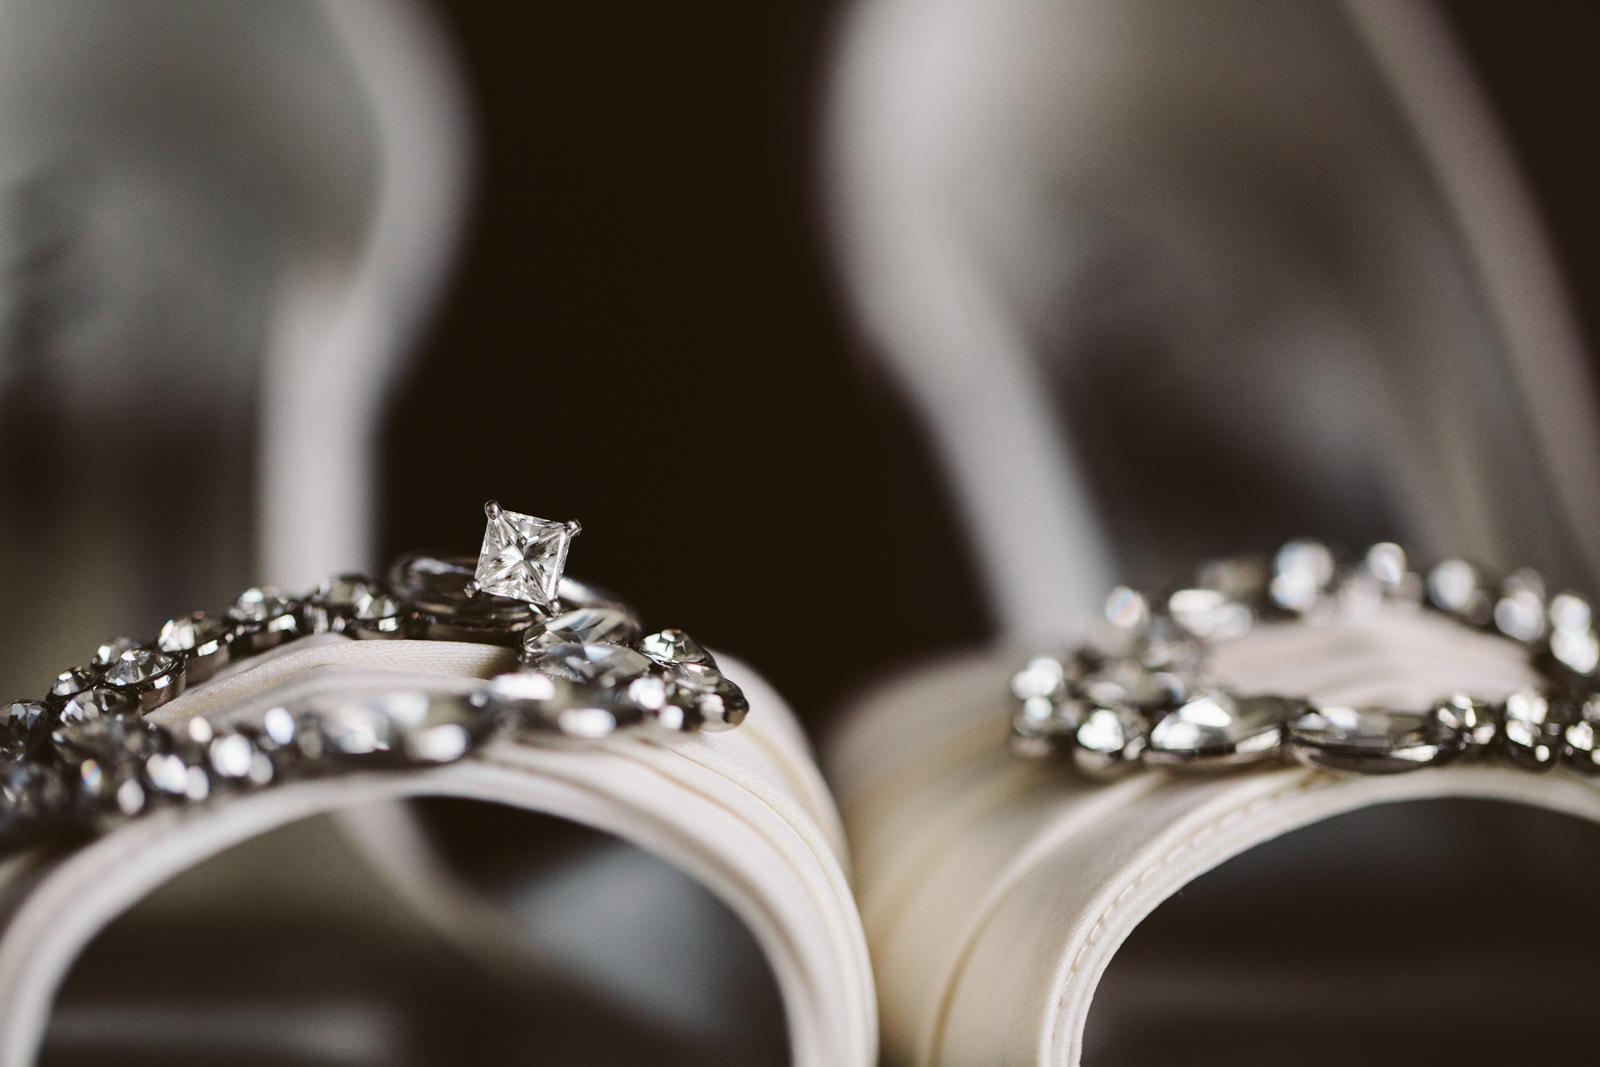 Eastons-Beach-Rotunda-Ballroom-Wedding-Newport-Rhode-Island-PhotographybyAmandaMorgan-12.jpg